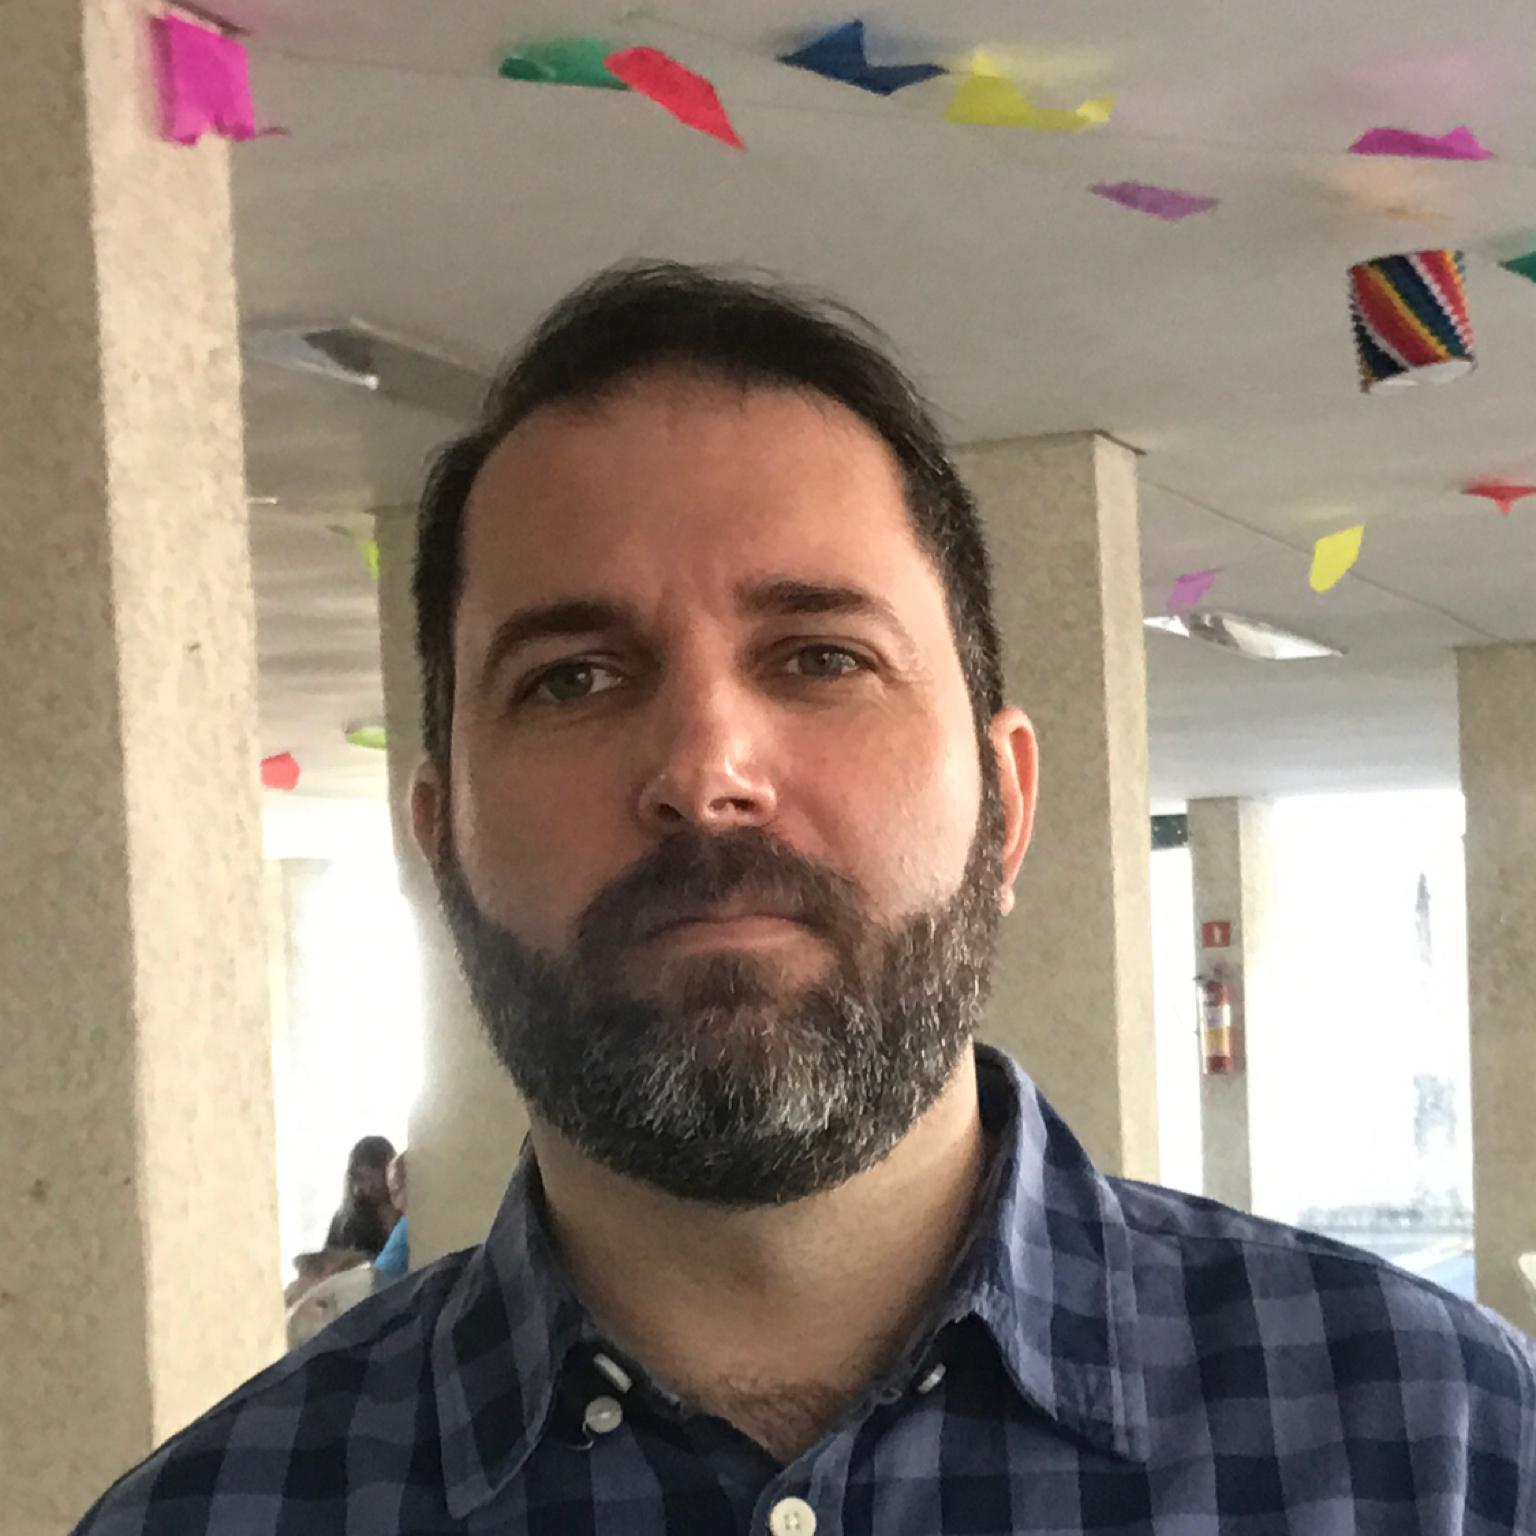 Leandro Feldens Soares